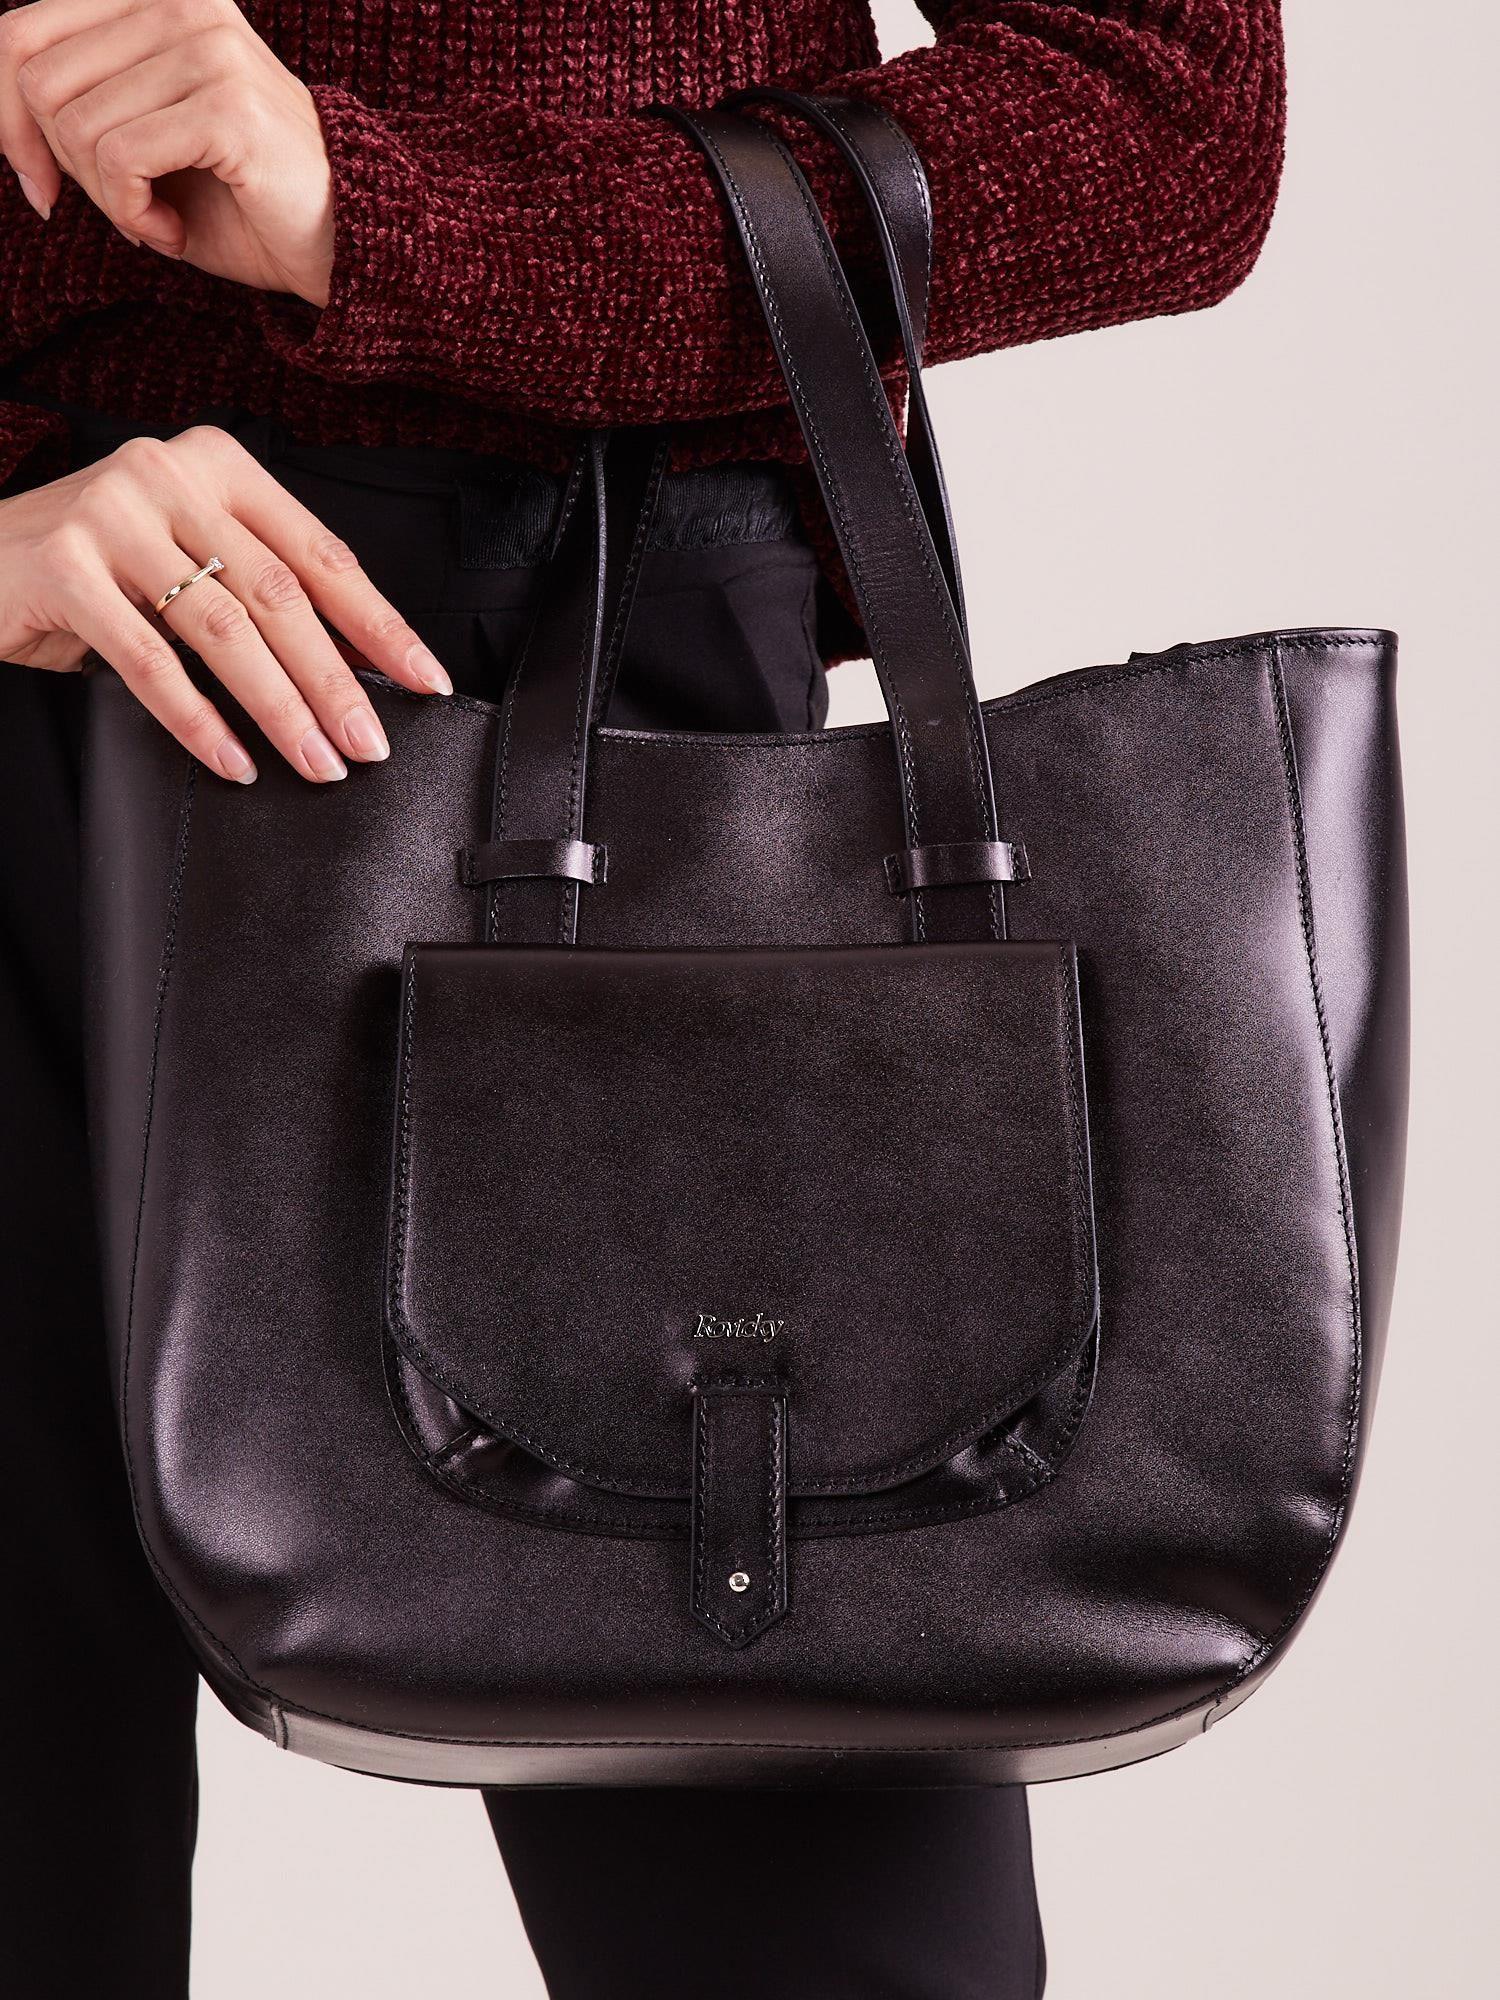 ebb3fcd4be08f Czarna skórzana torba z odpinanym paskiem - Akcesoria torba - sklep ...